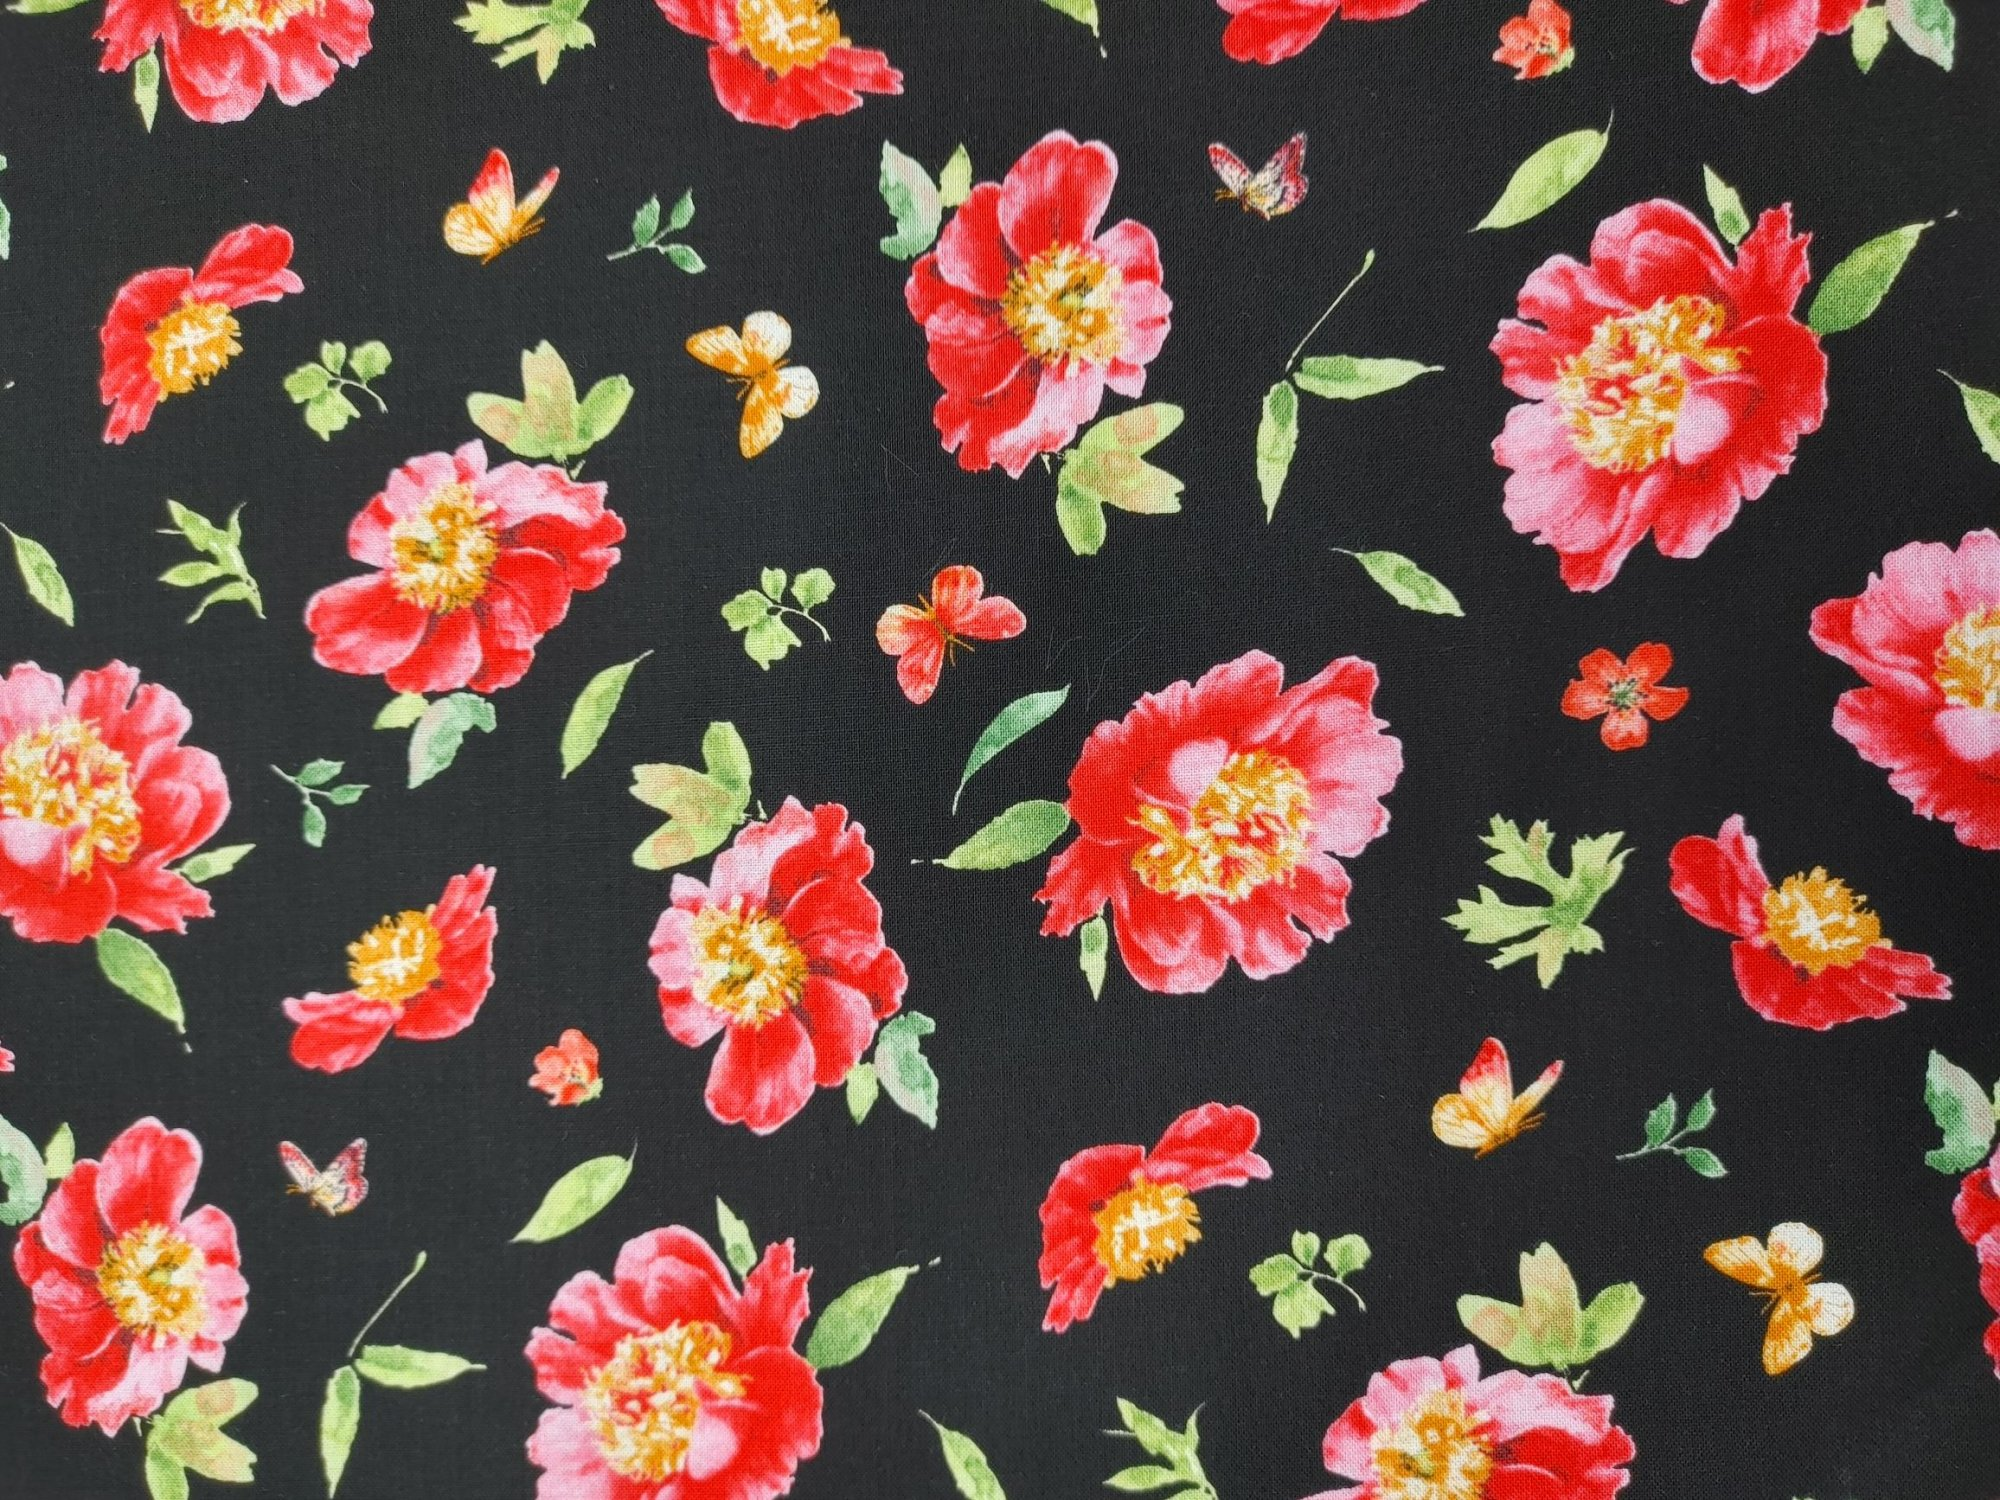 Pink Garden - Flower Toss on Black